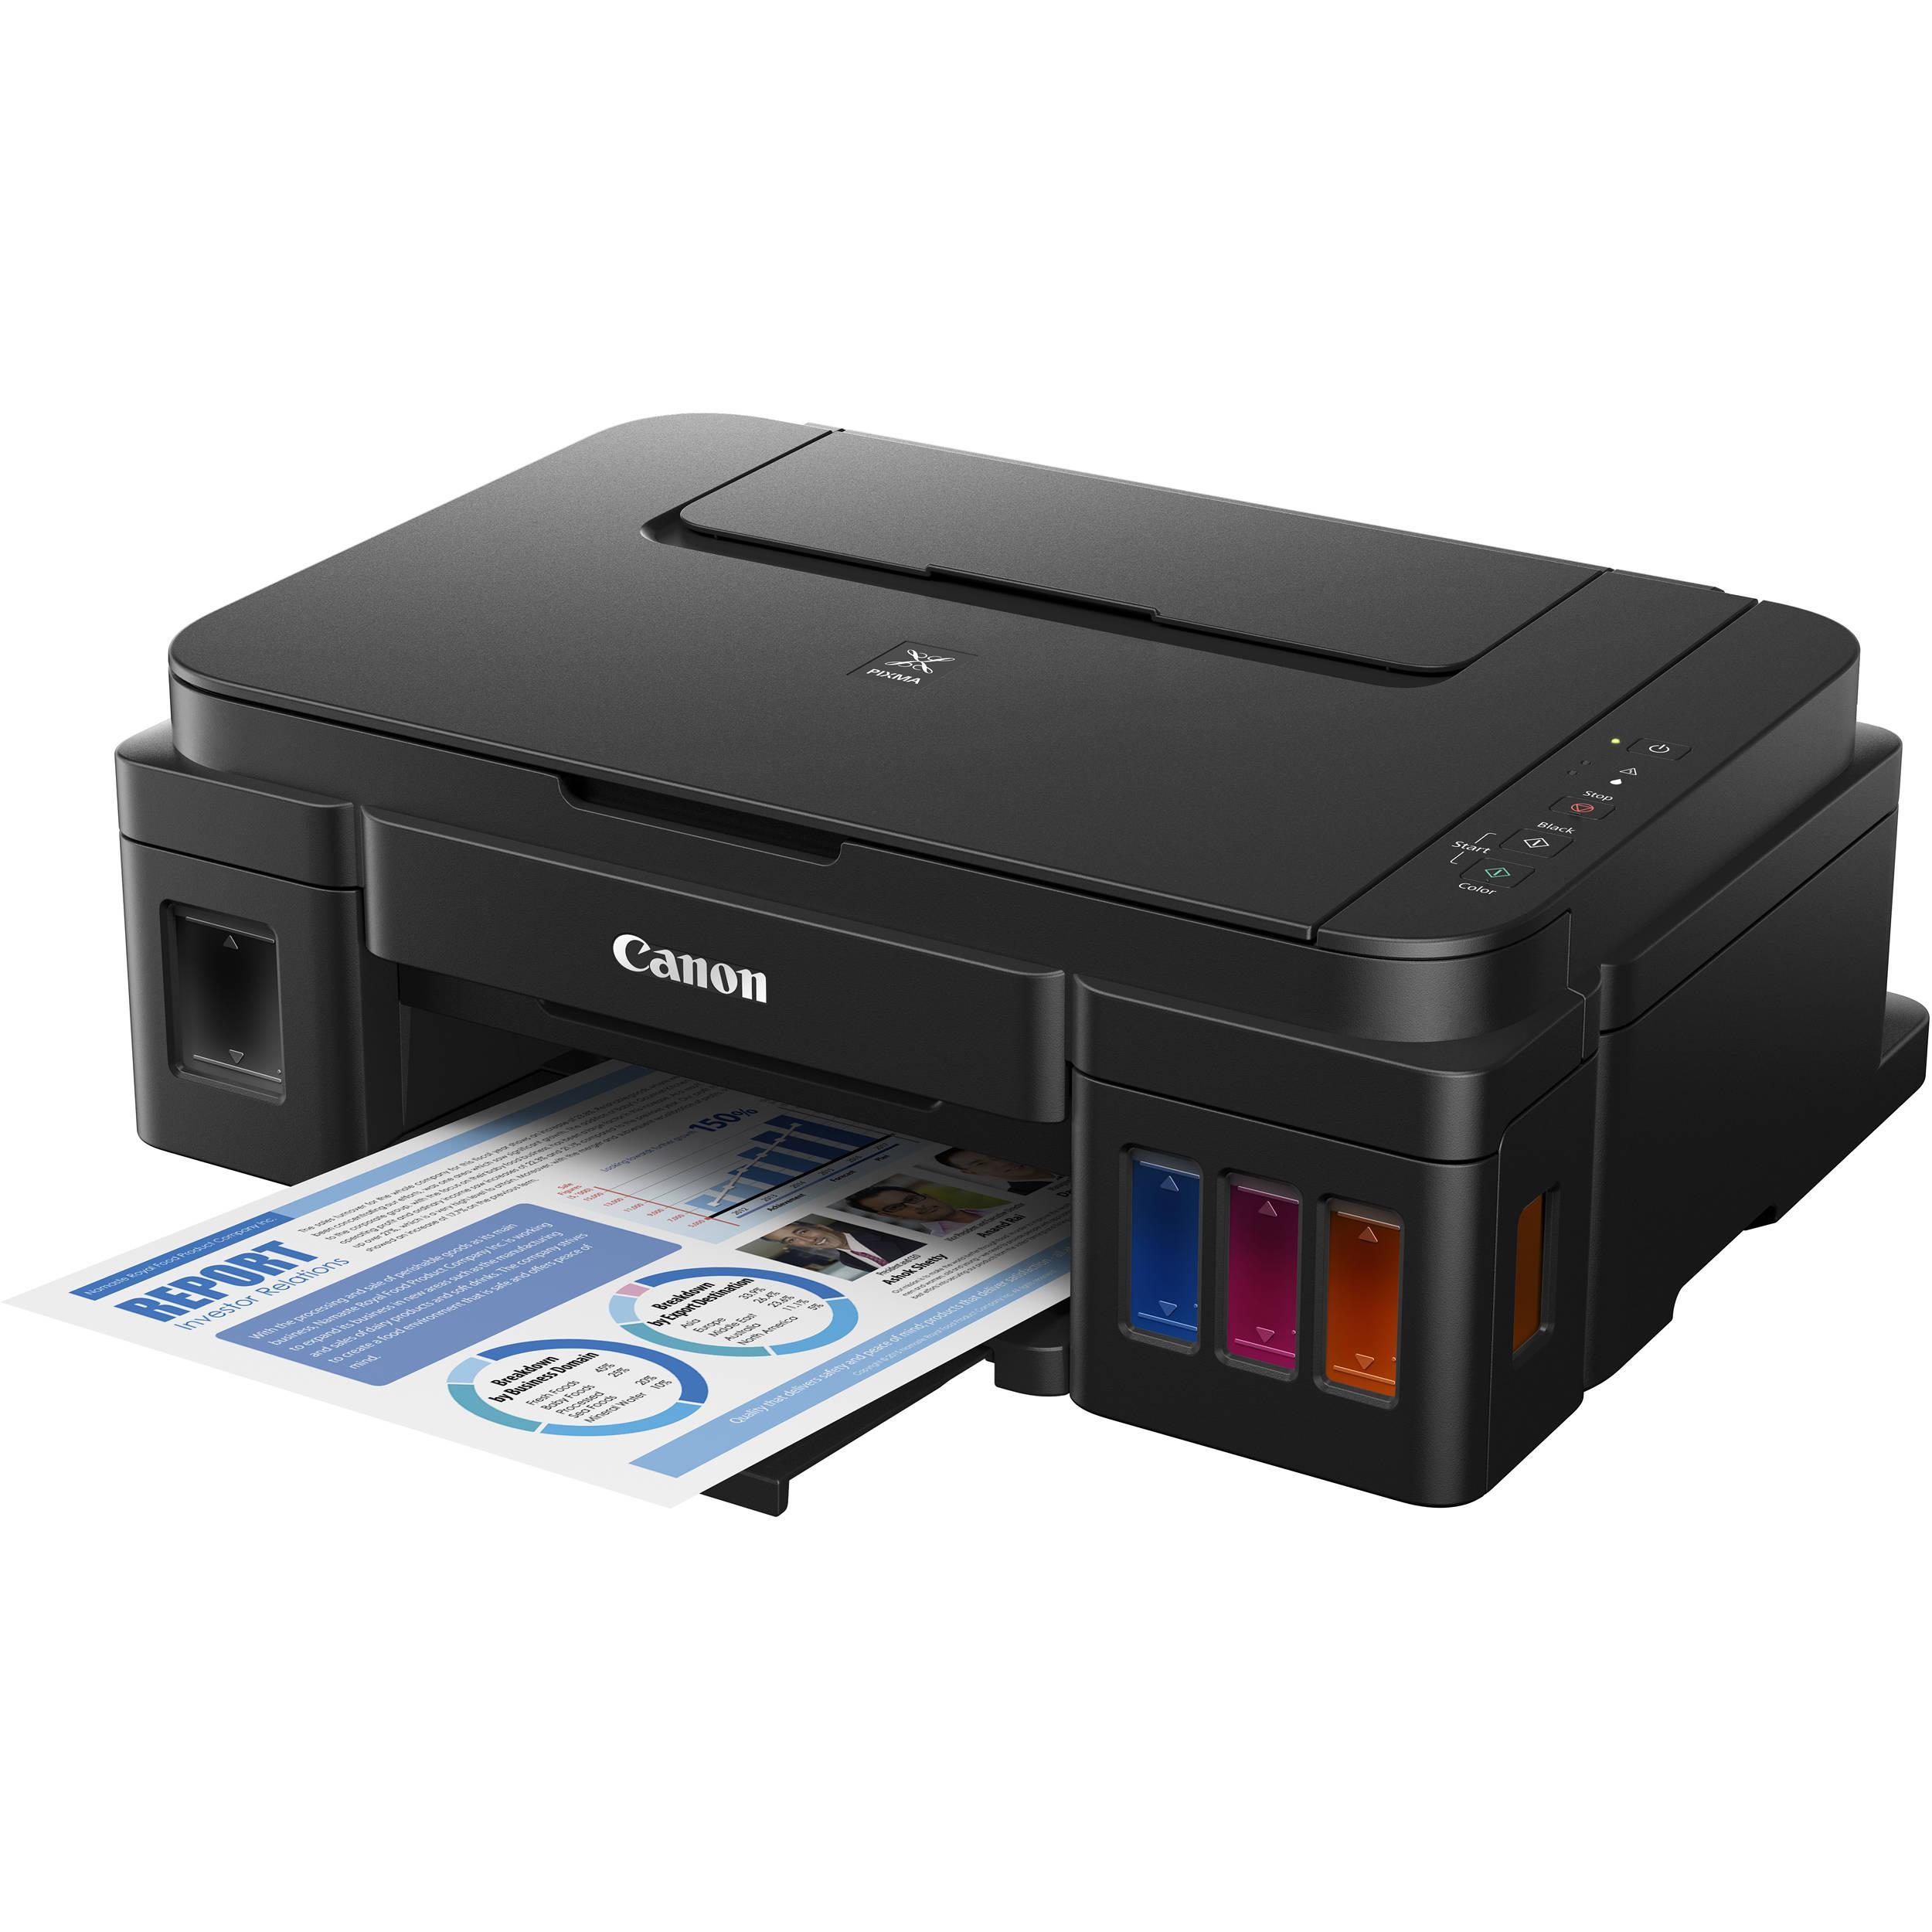 Canon PIXMA G2200 MegaTank All-in-One Inkjet Printer